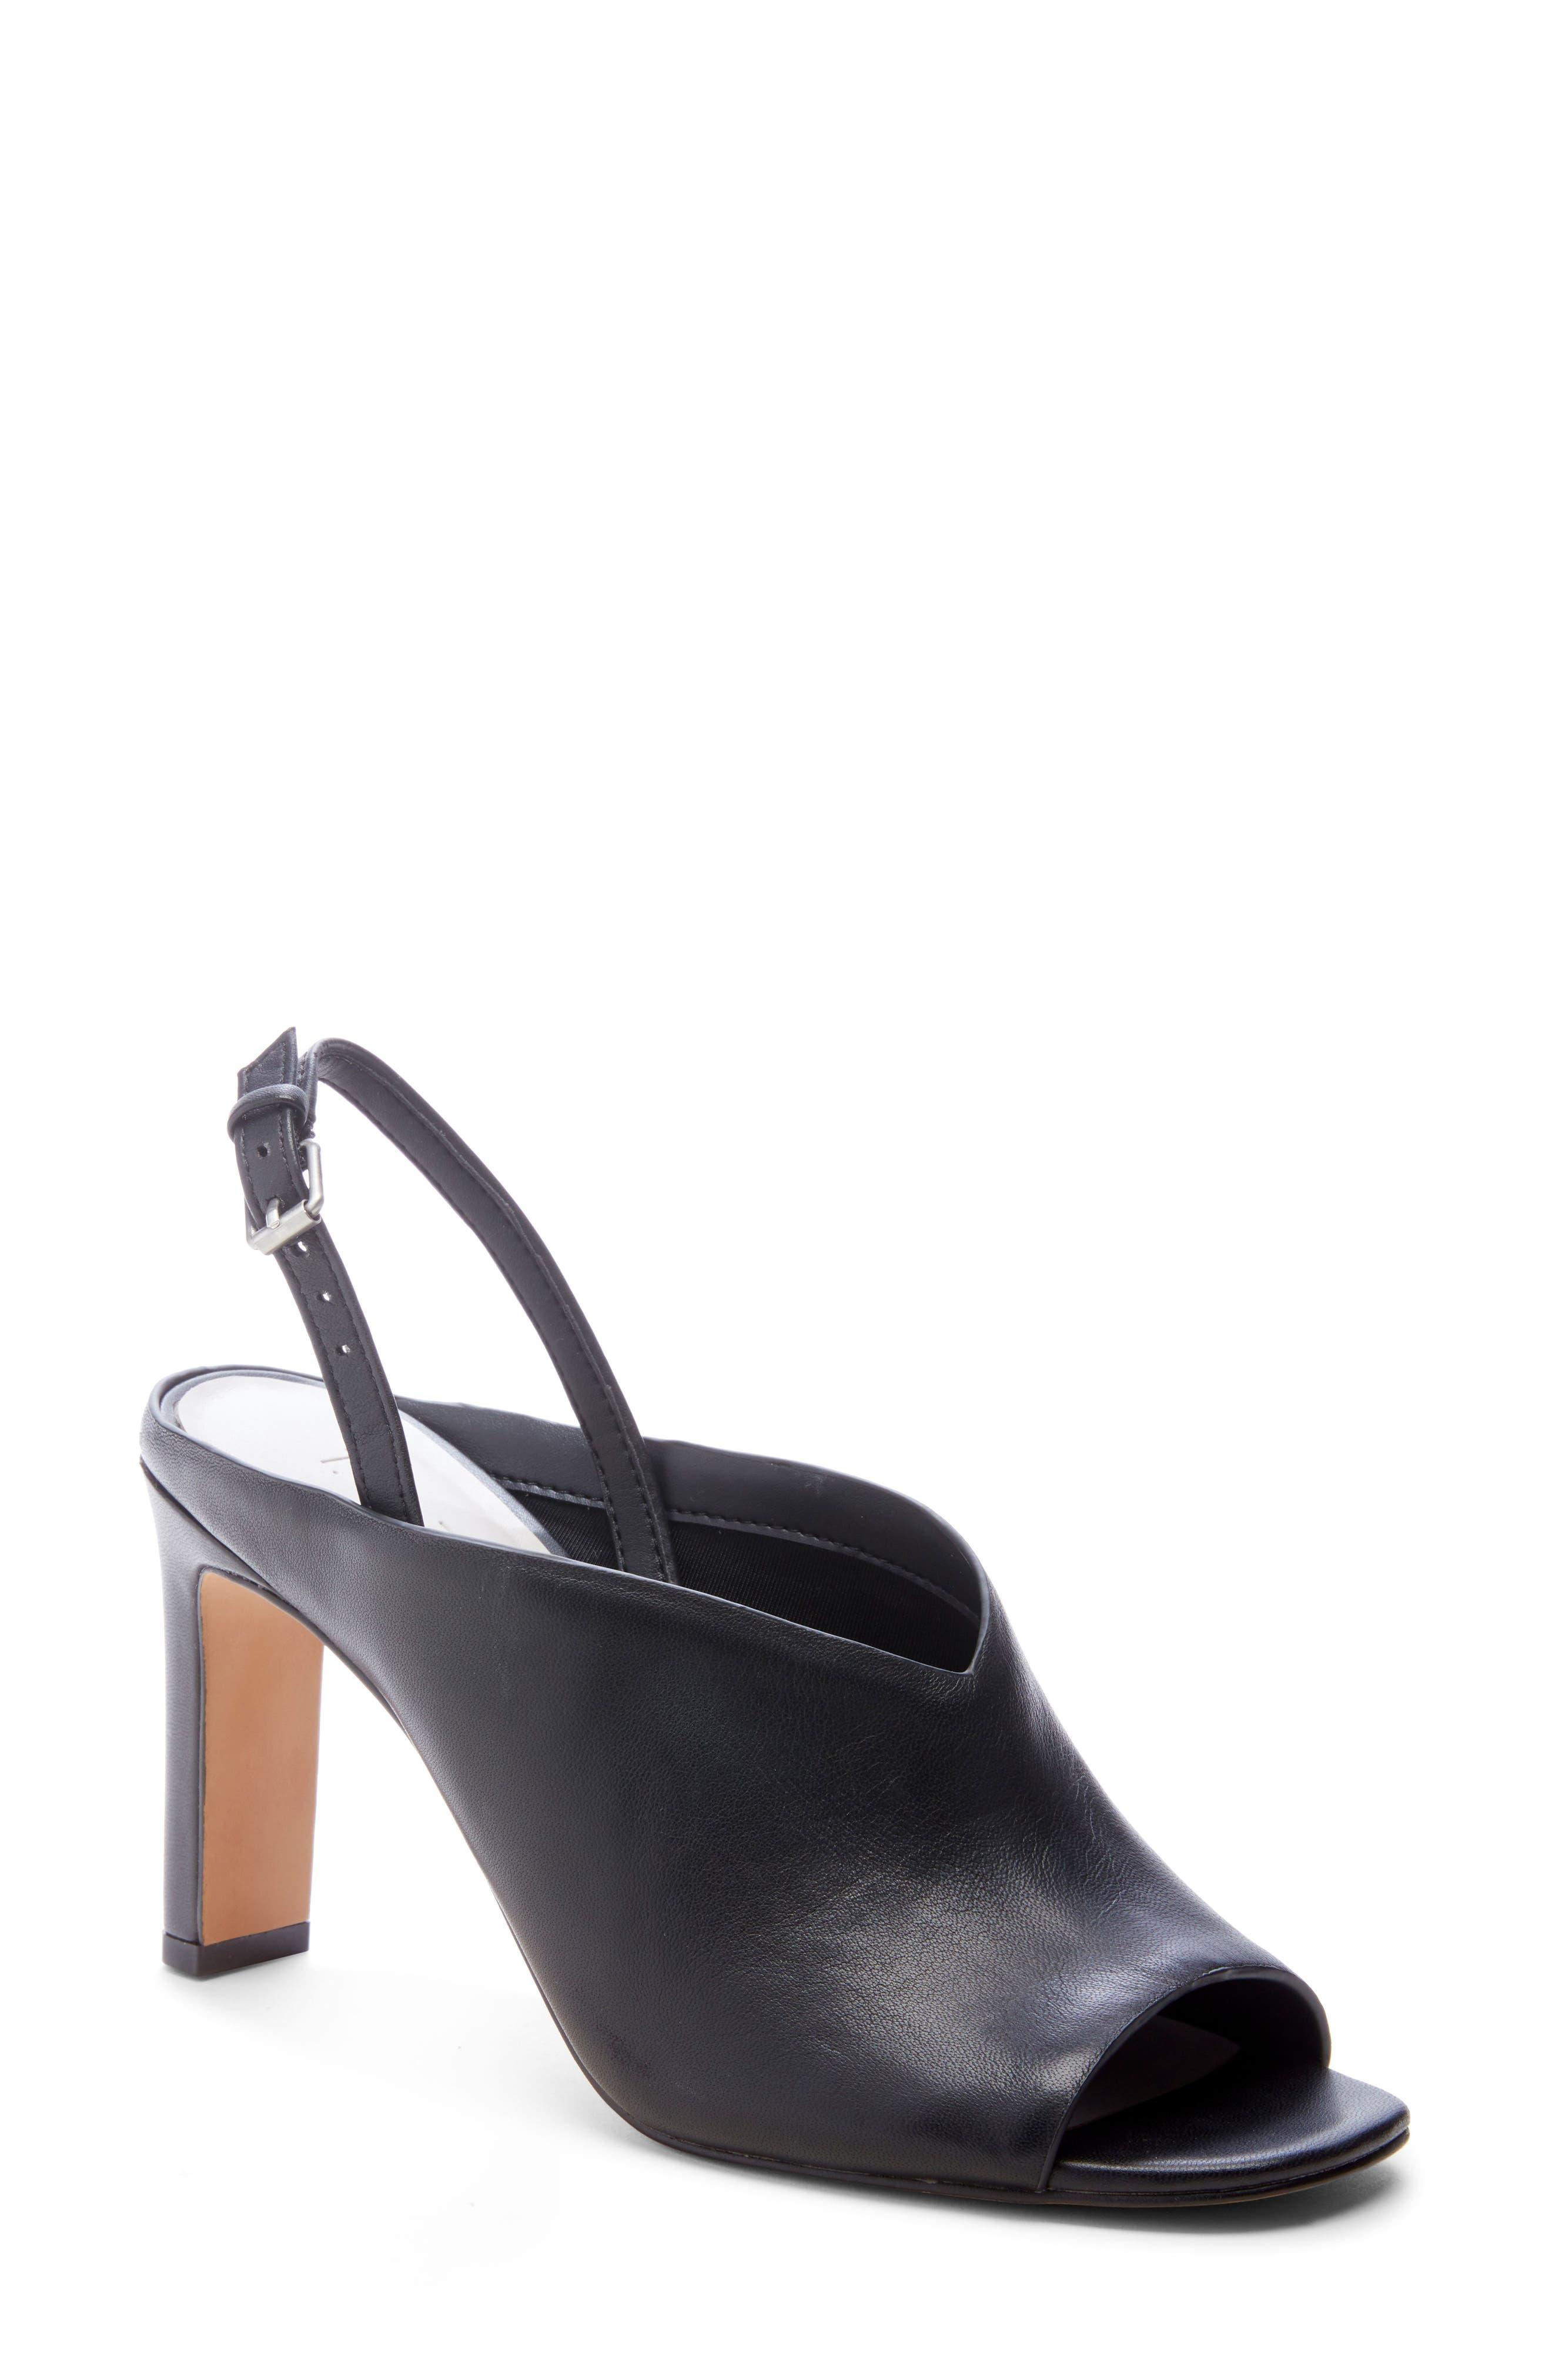 1. State Pettle Slingback Sandal- Black